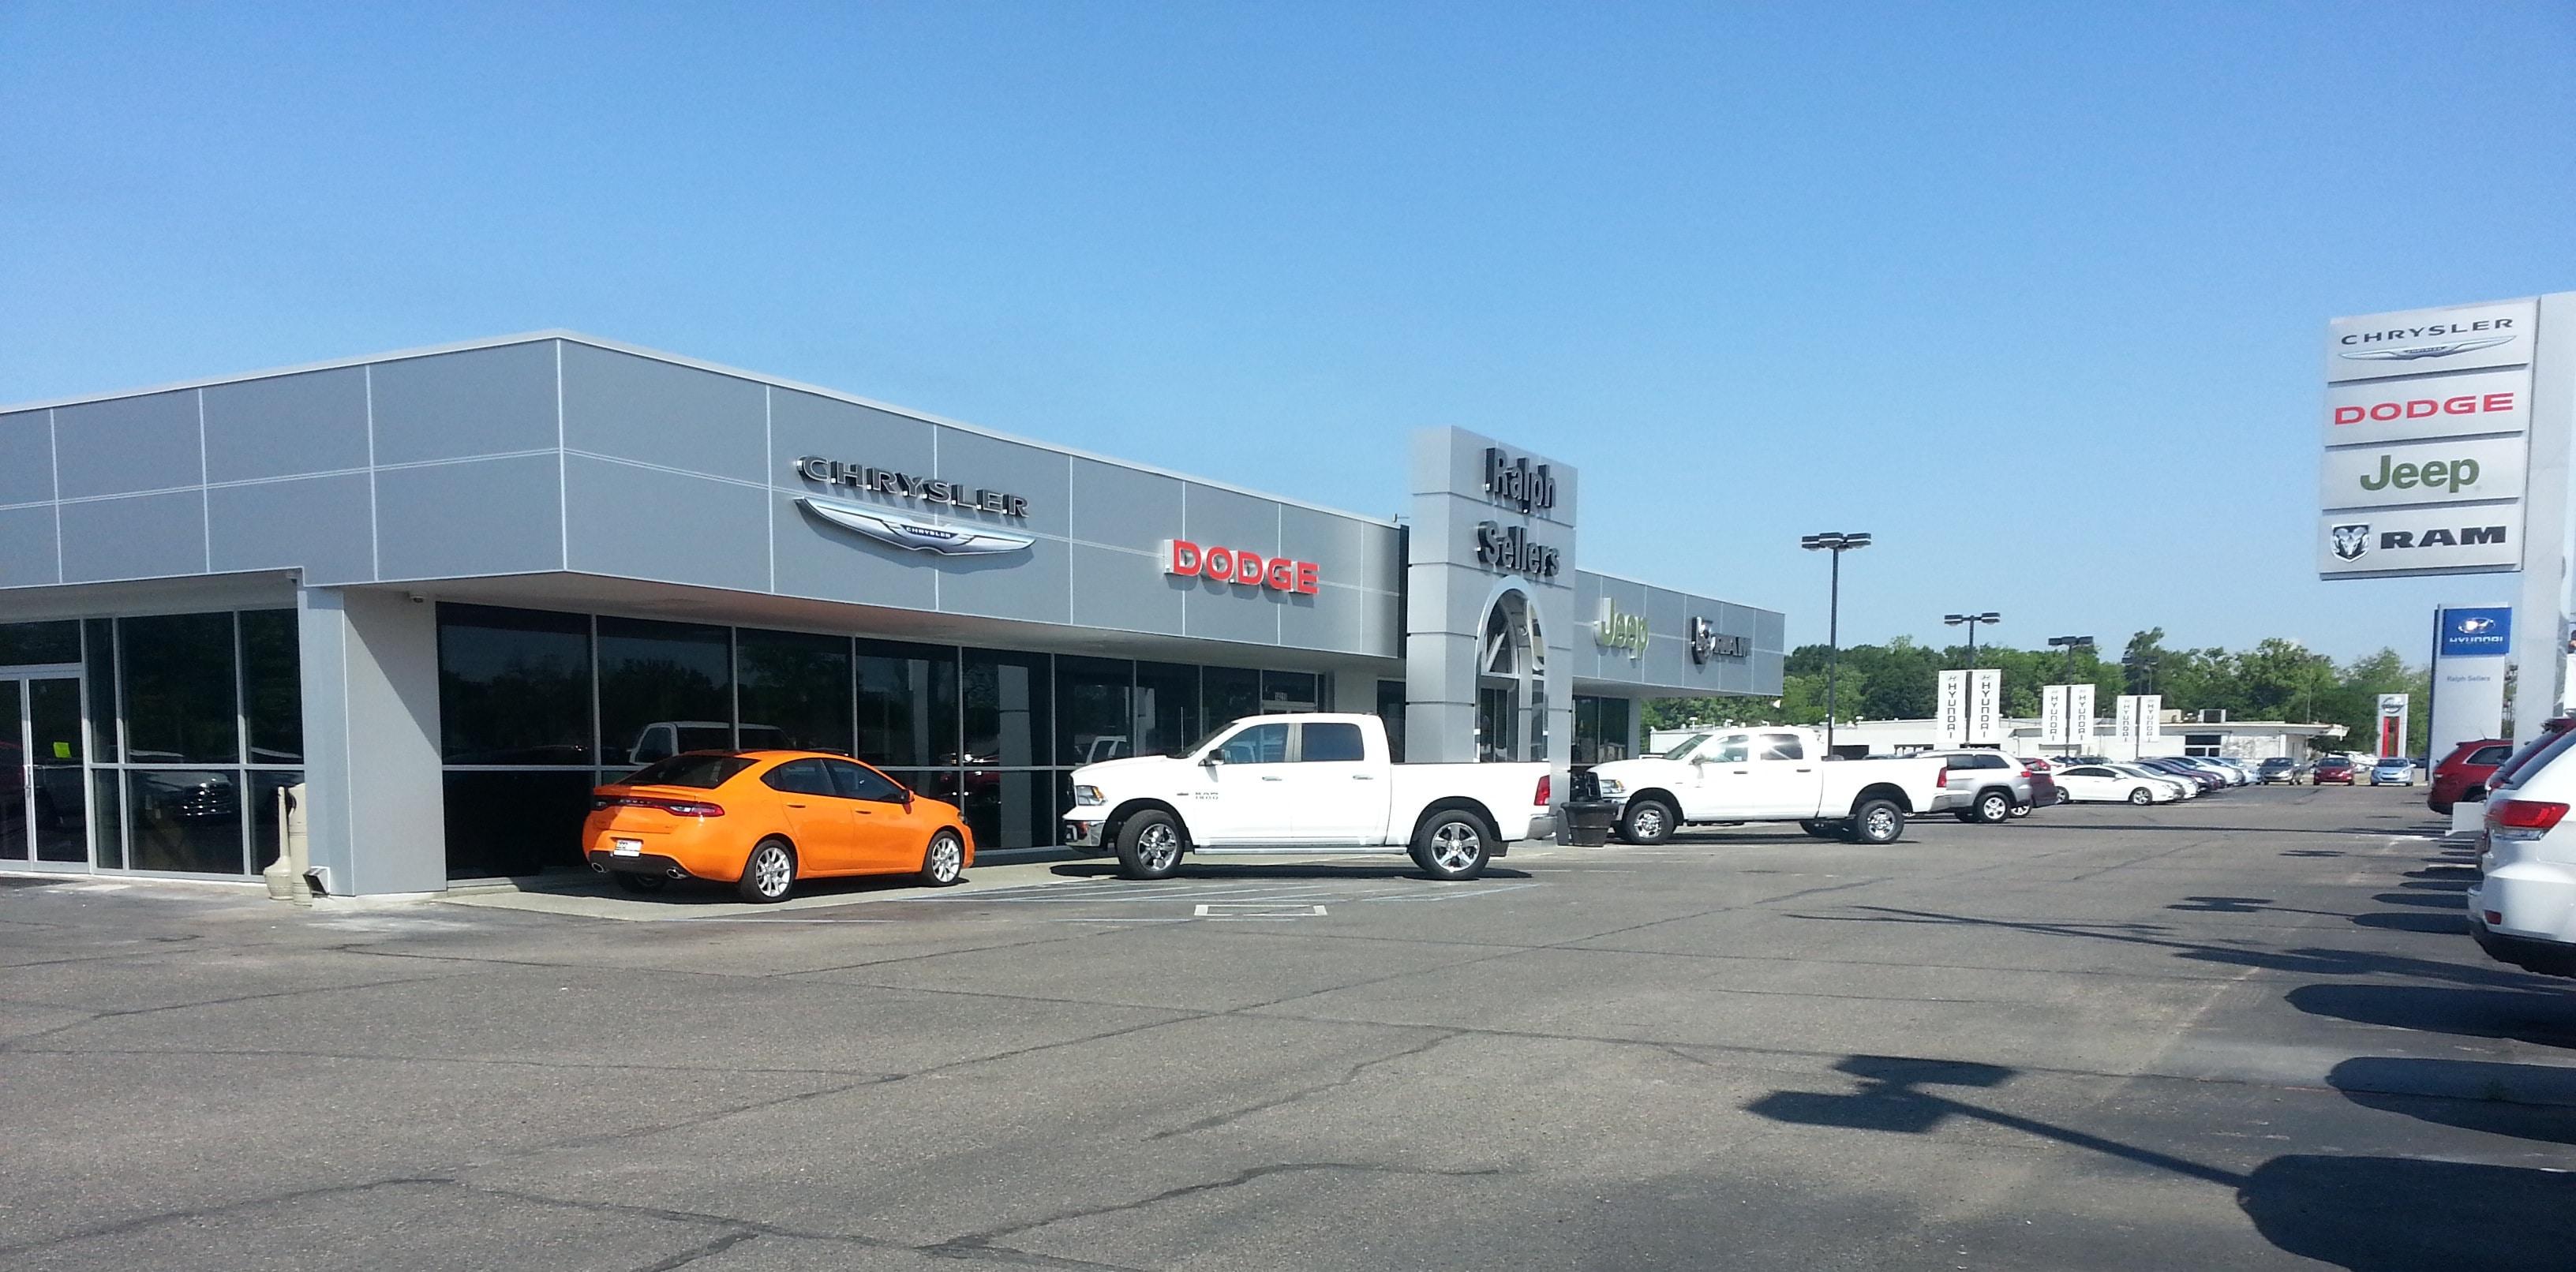 dodge dealership baton rouge Ralph Sellers Chrysler Dodge Jeep RAM Dealership, Baton Rouge